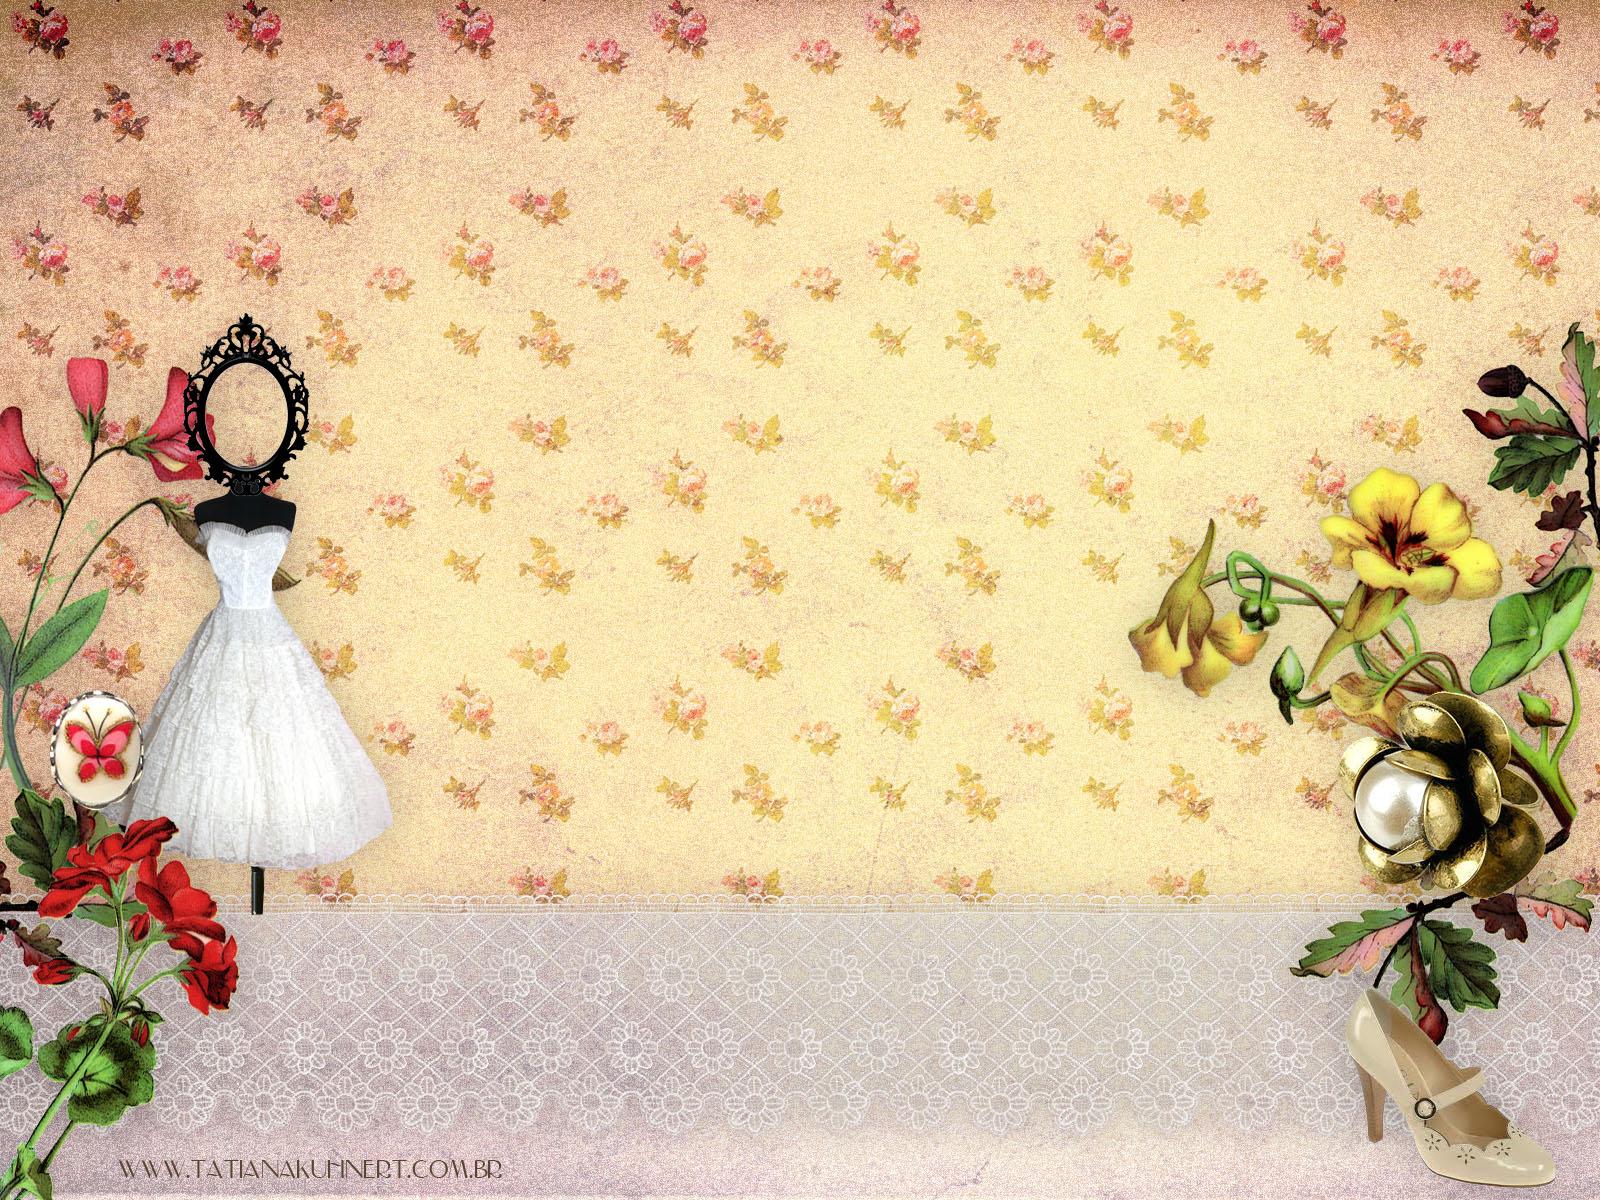 http://2.bp.blogspot.com/_-P03T5QxRl4/TNsh5xaOlwI/AAAAAAAAAN0/CQ0MBOTdgK0/s1600/wallpaper_nov10_1600x1200_sem.jpg